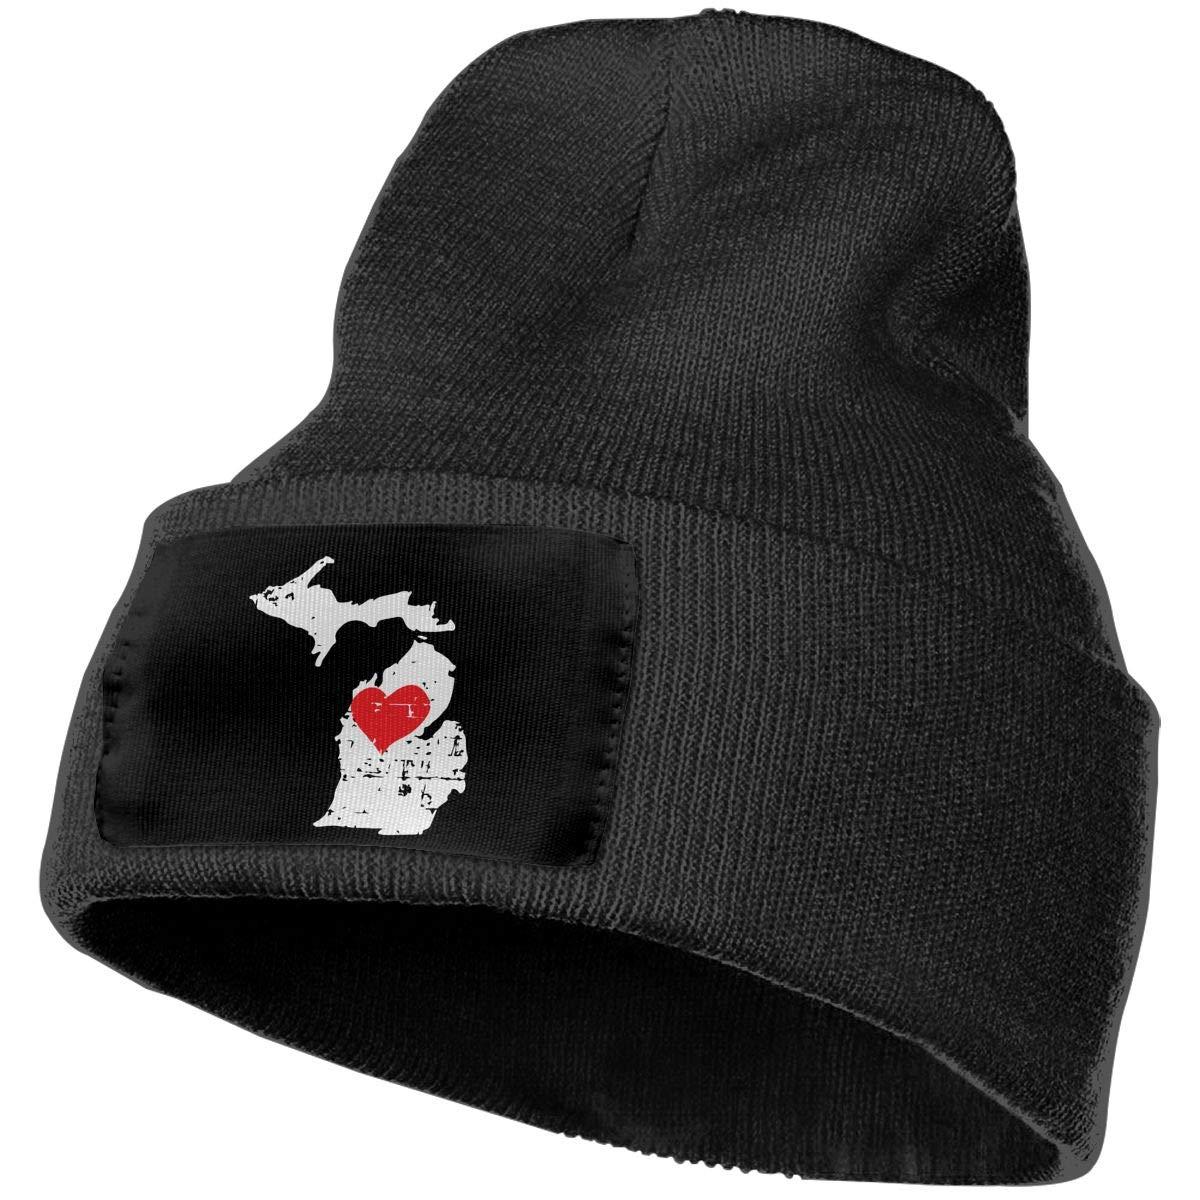 COLLJL-8 Men//Women Michigan State Map Outdoor Stretch Knit Beanies Hat Soft Winter Skull Caps